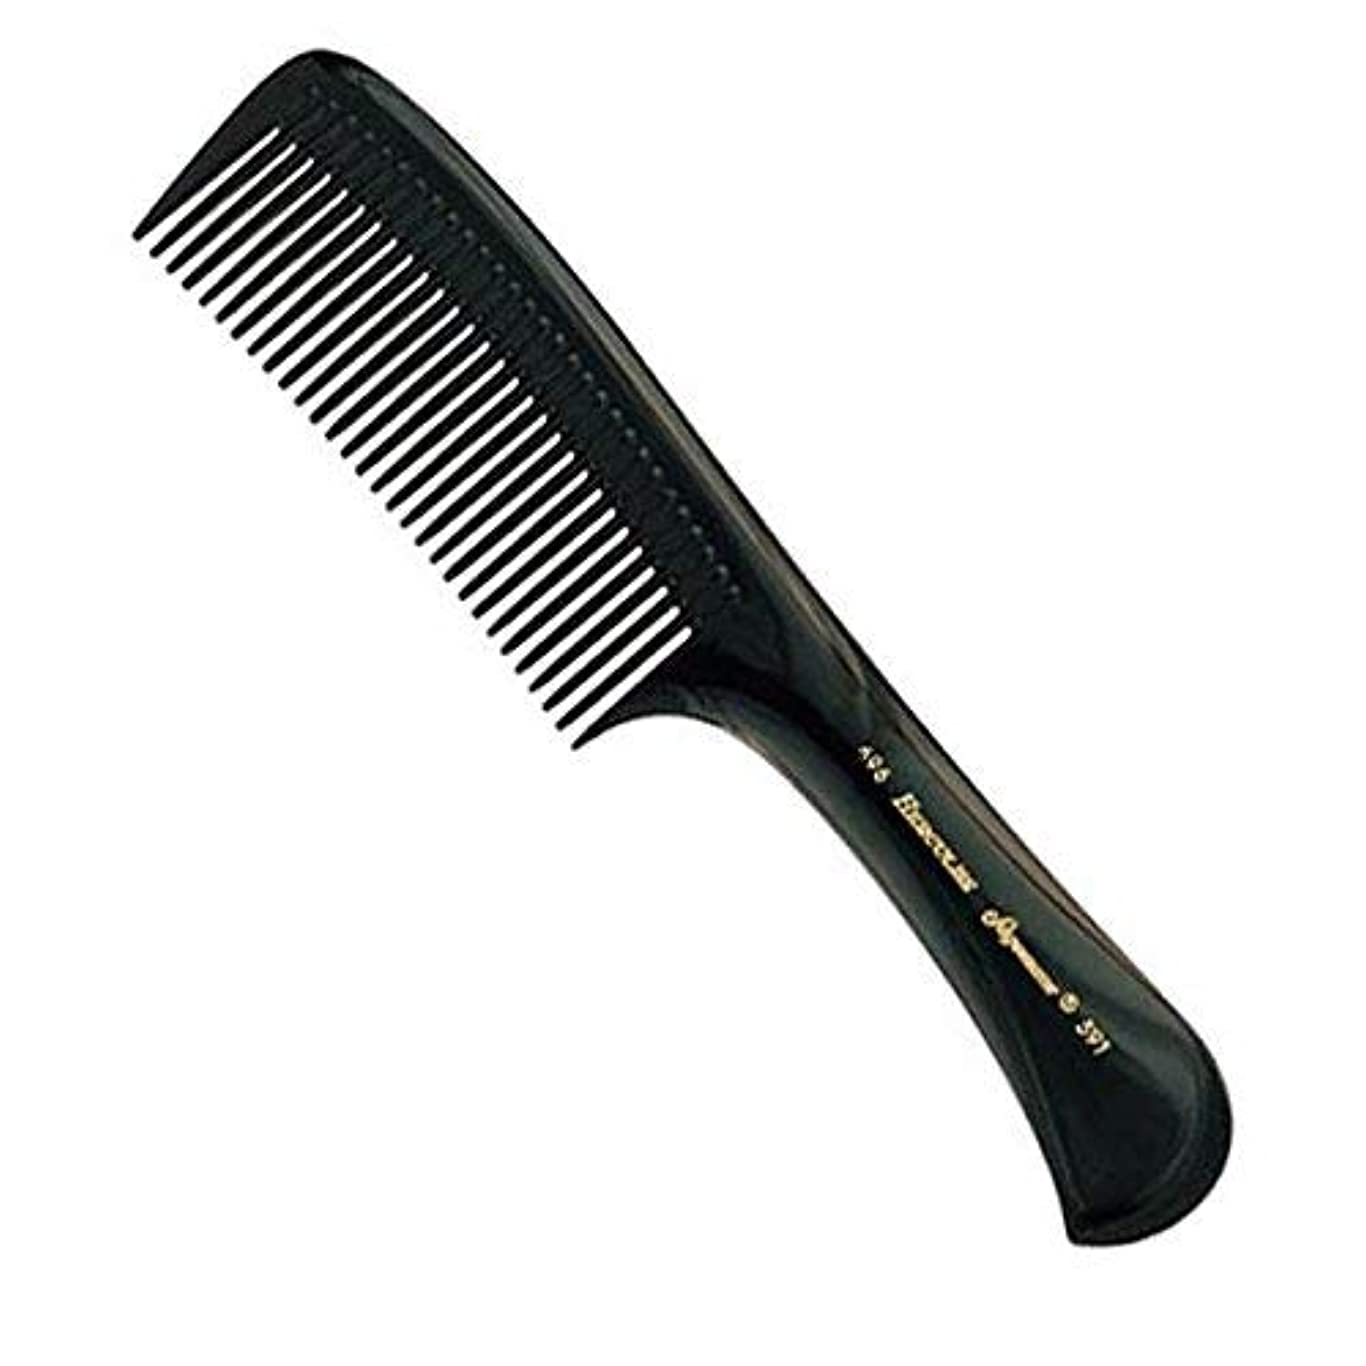 Hercules Sagemann Seamless Handle Detangling Hair Comb, 22.7 cm Length [並行輸入品]